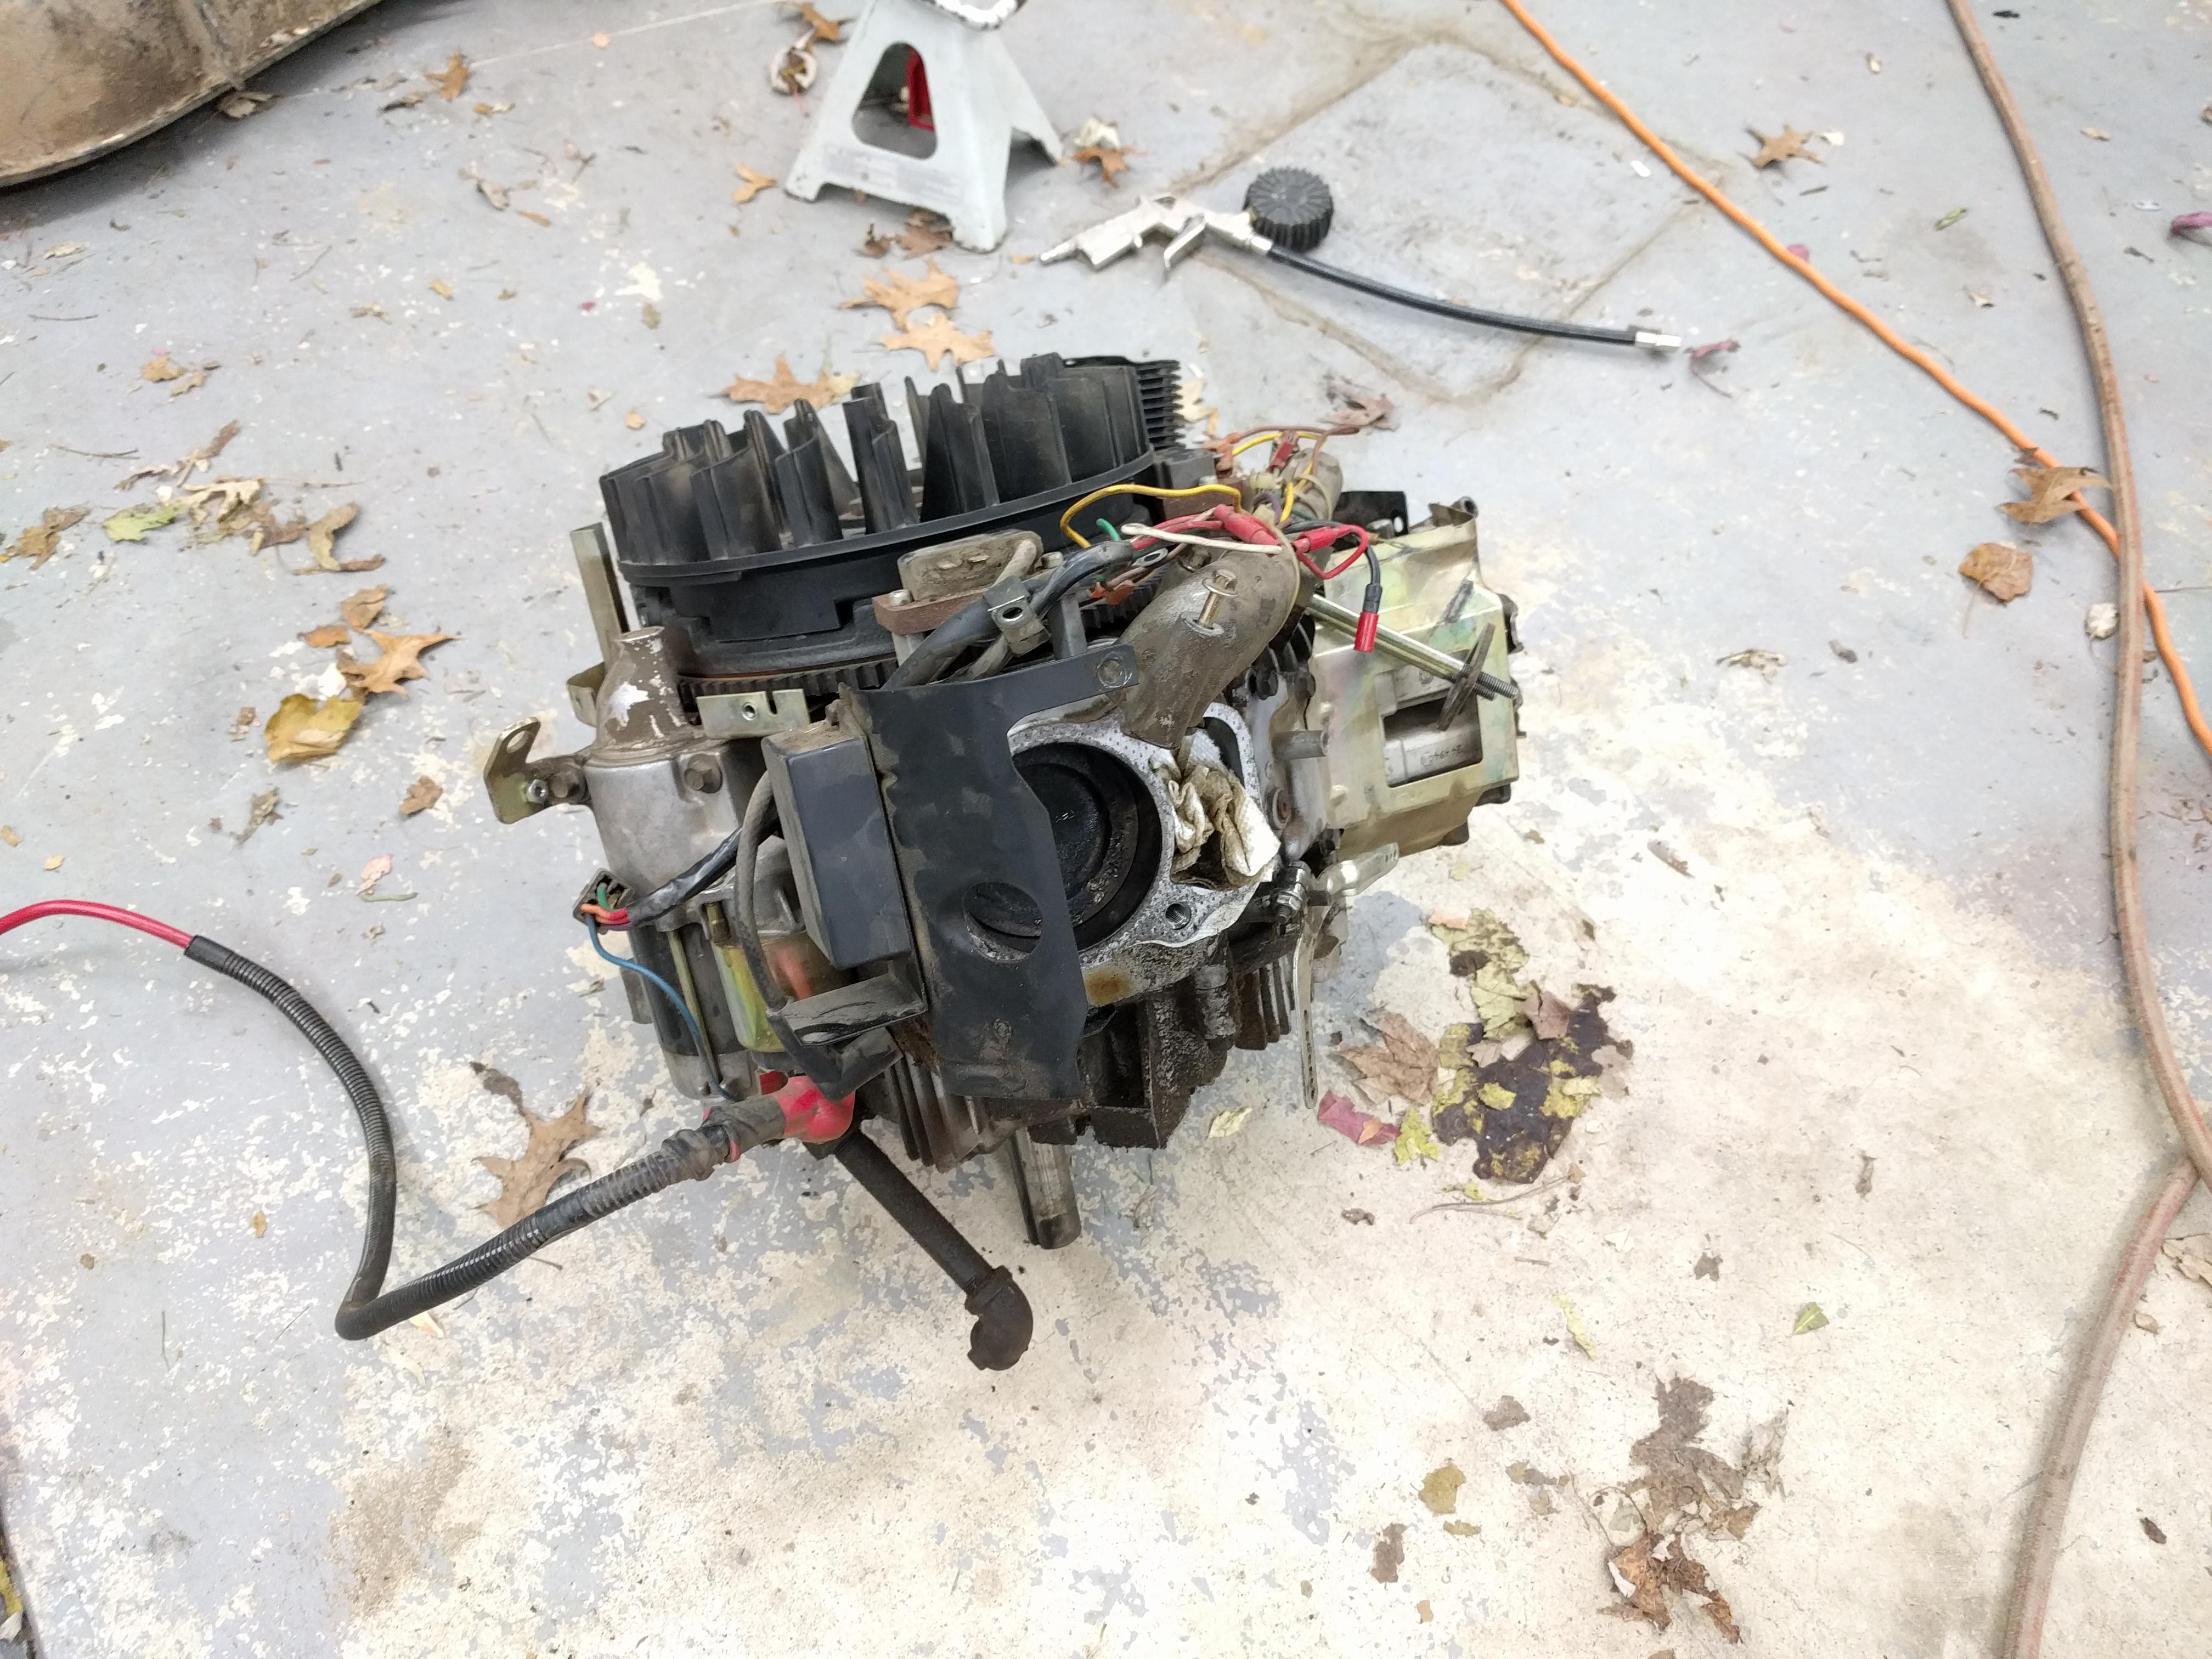 Automotive Matt Lapaglia Mcsd Kohler Command 2 7 Engine Schematics Next Step Take The Off Tractor